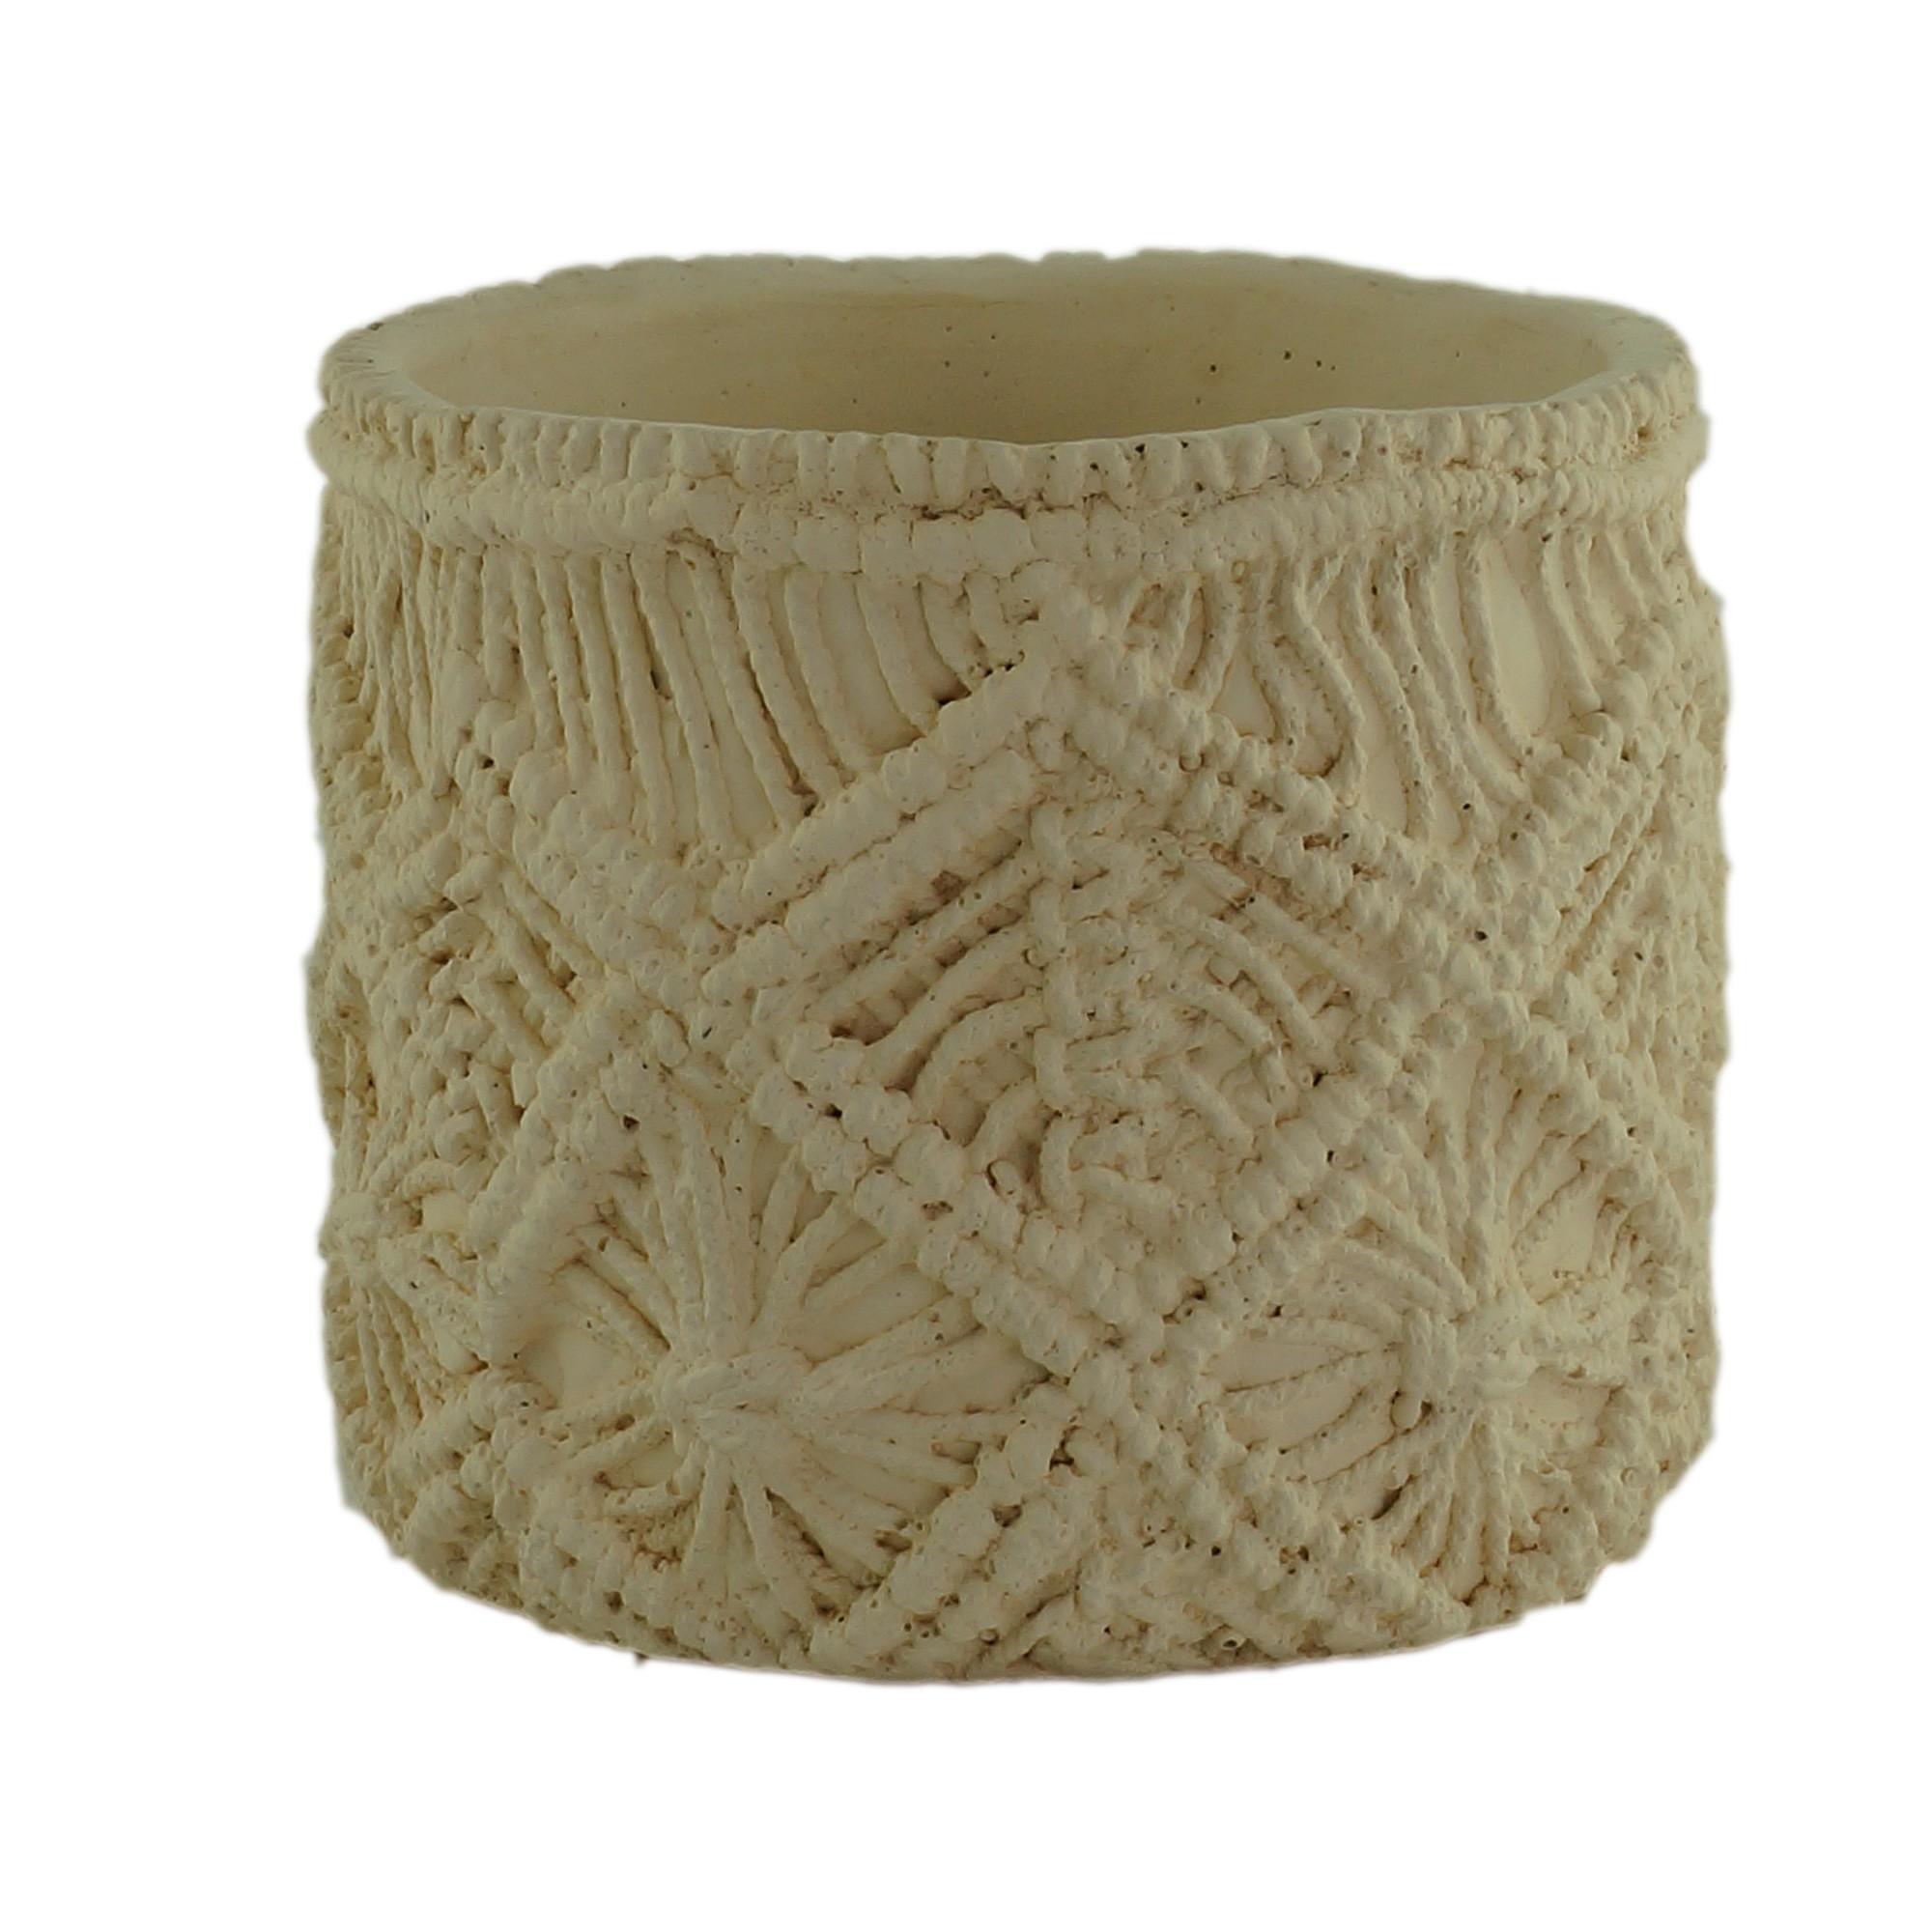 Vaso Decorativo de Concreto Redondo 12 cm - Urban